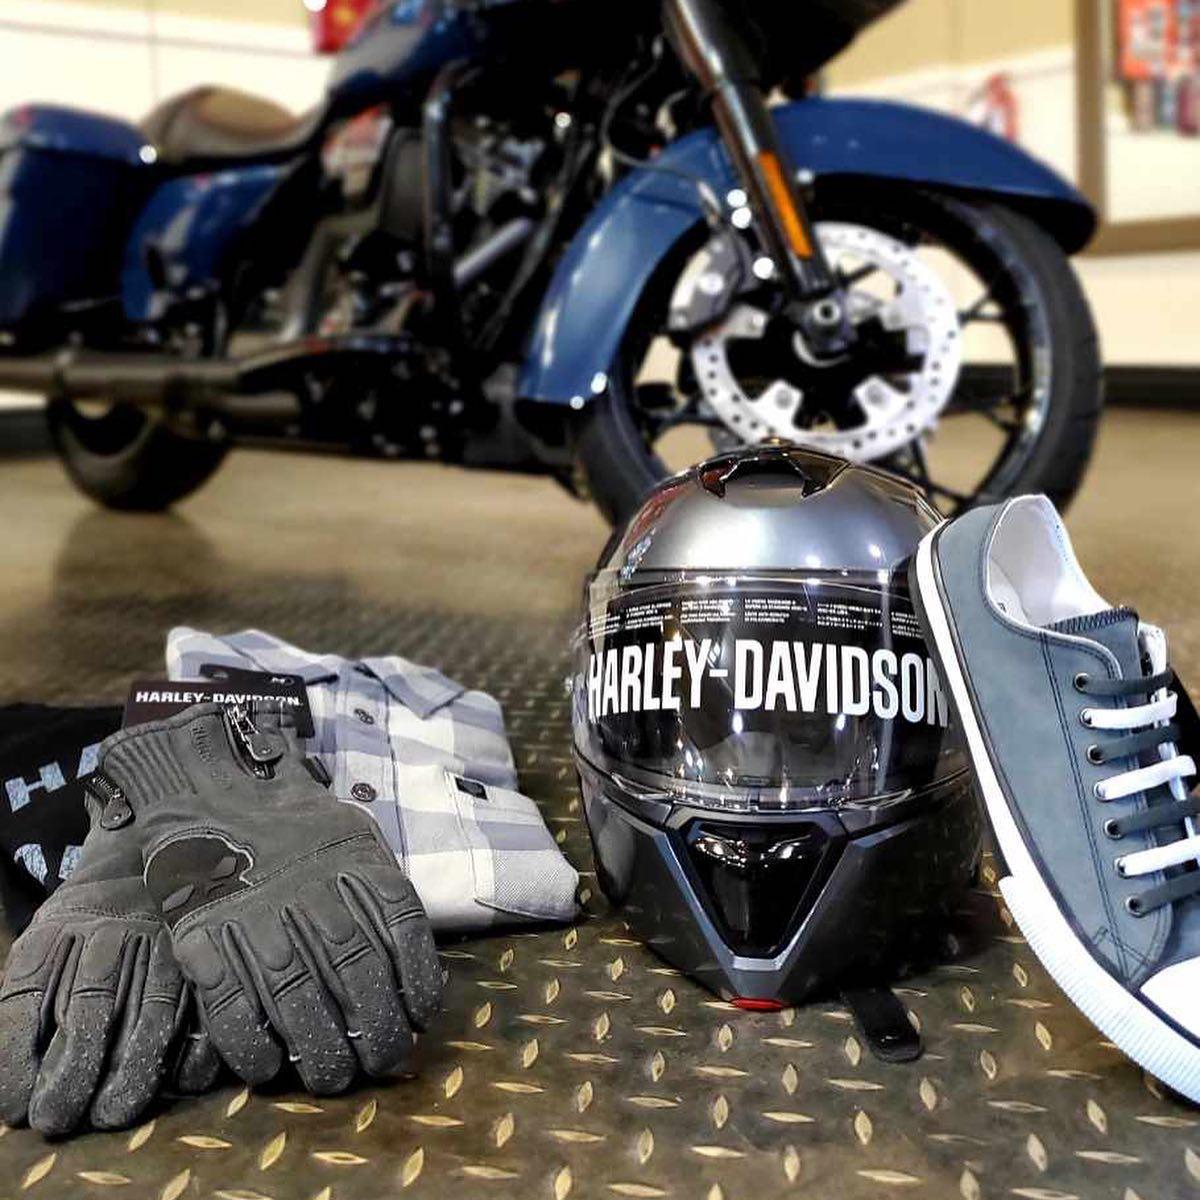 MotorClothes gear at Gasoline Alley Harley-Davidson